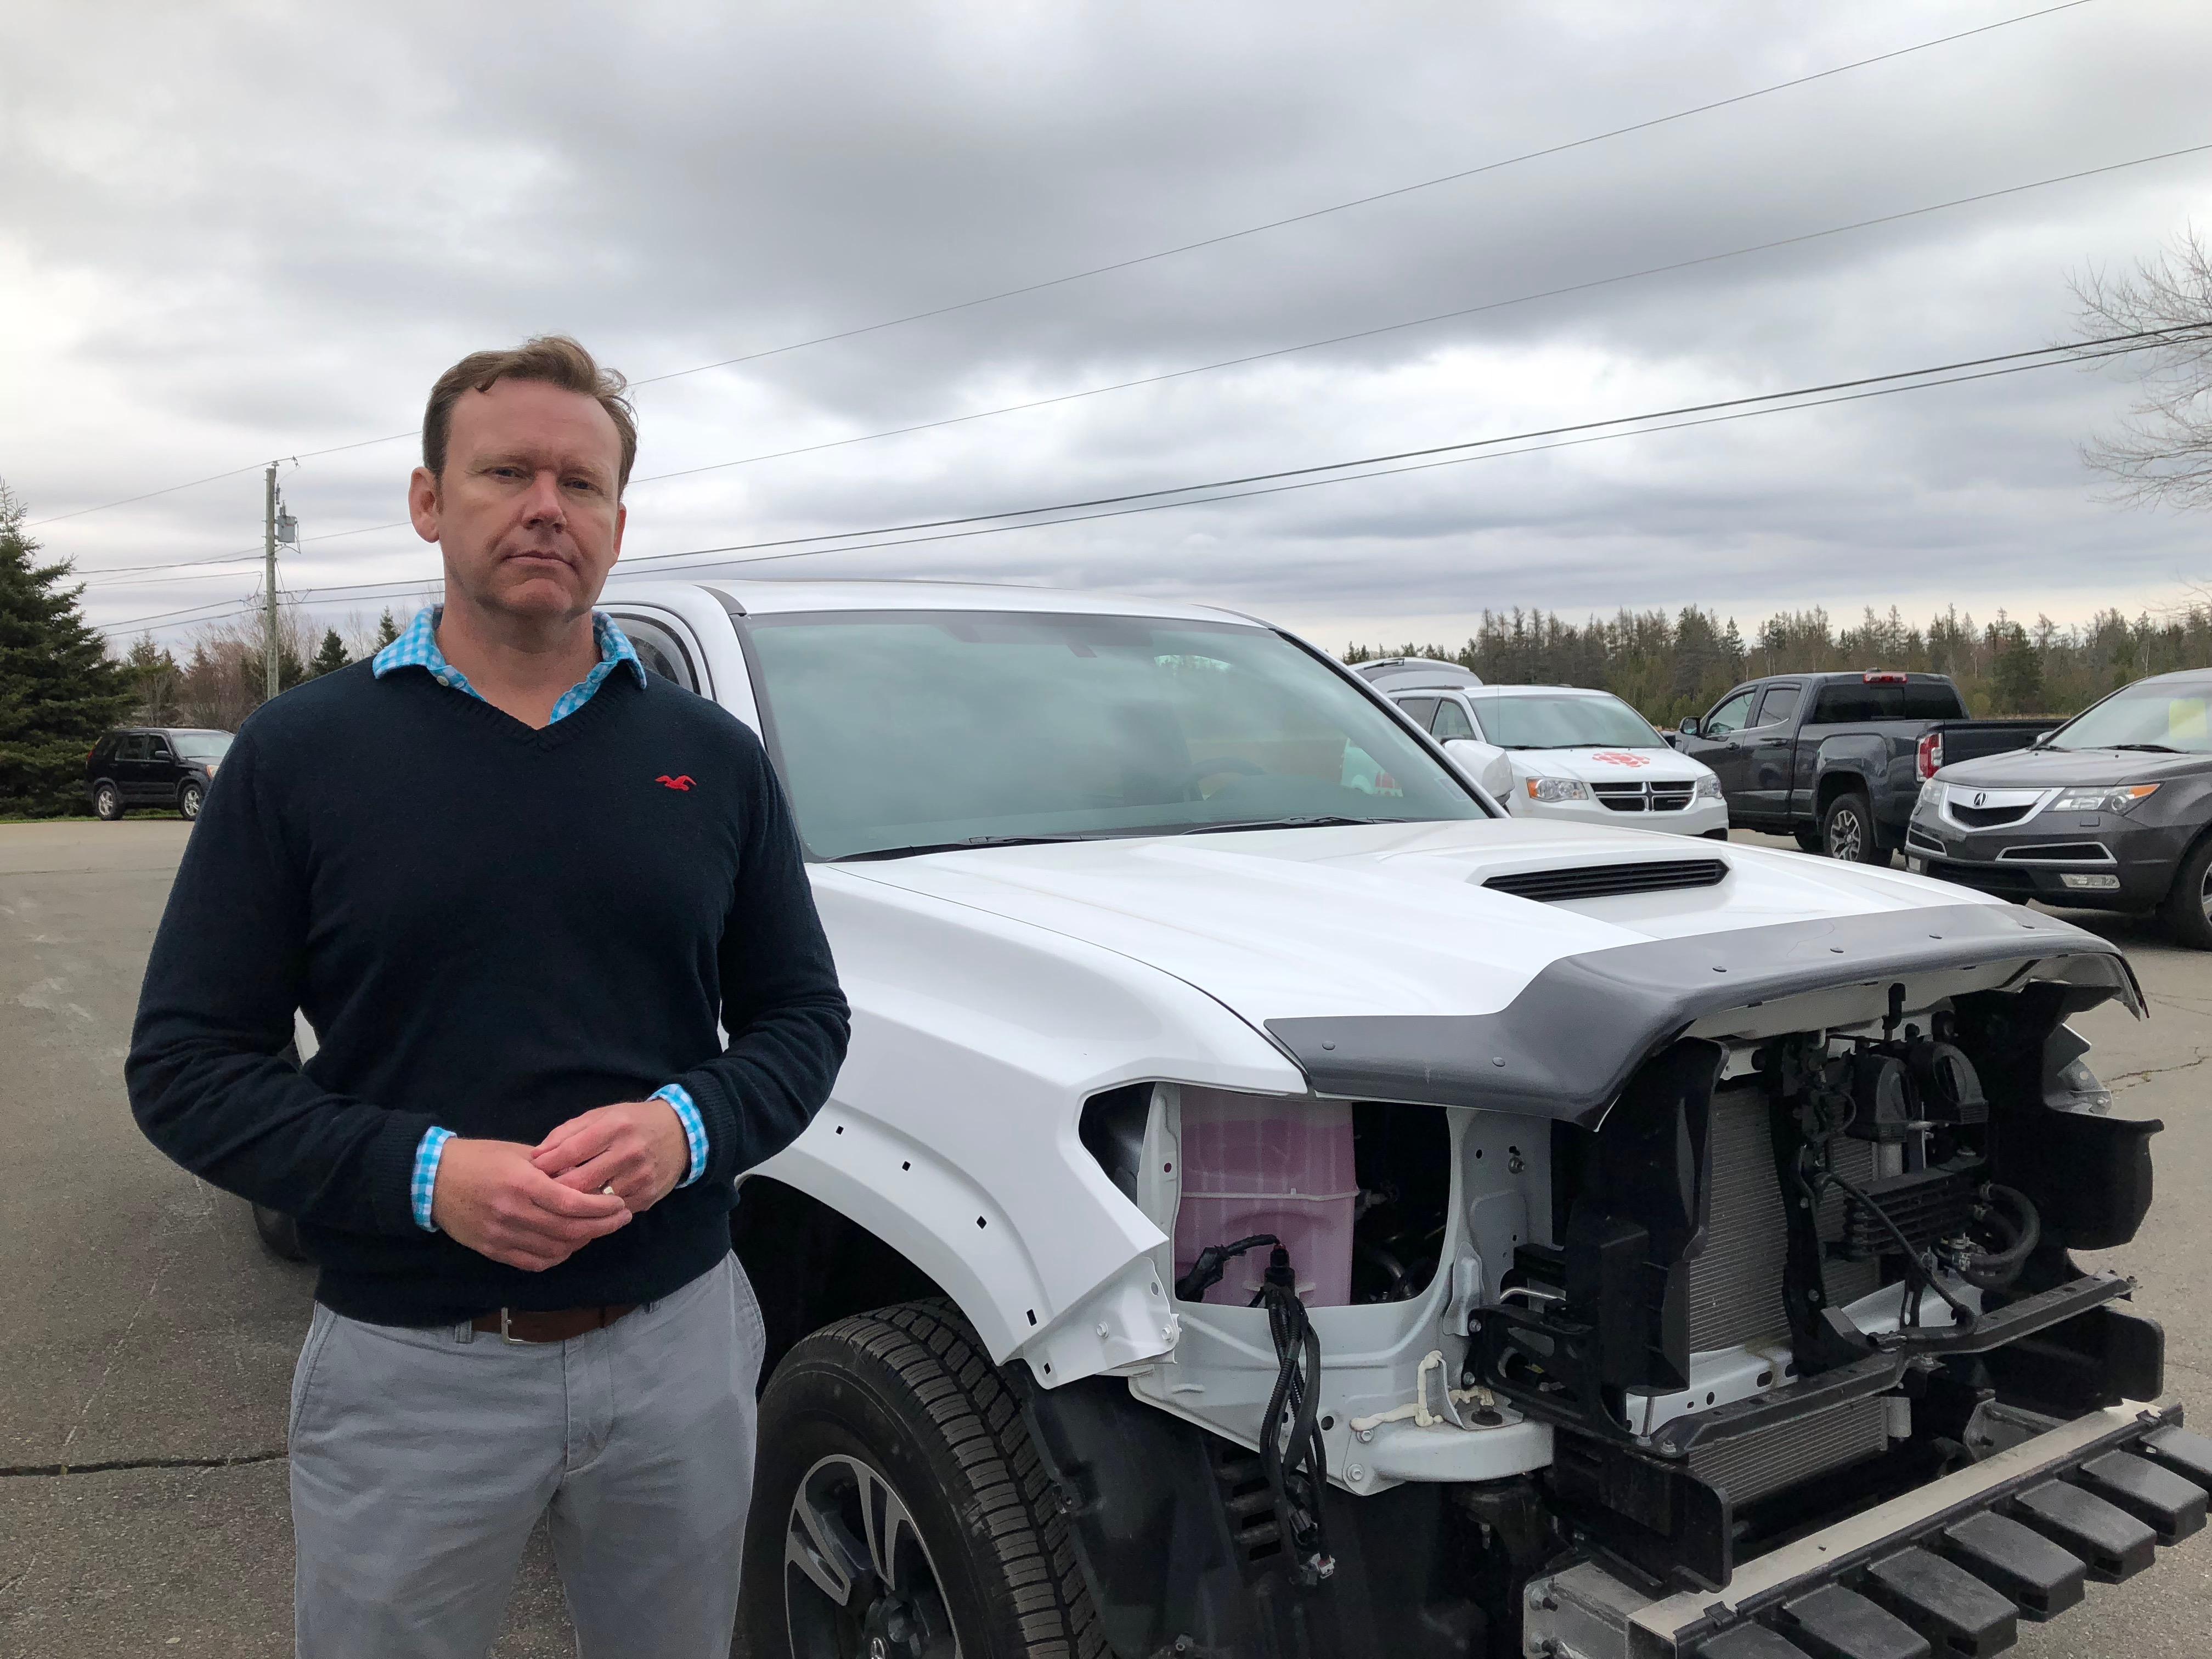 Sam Dalton's new Toyota Tacoma sustained $9,200 in damage. (Sally Pitt/CBC)